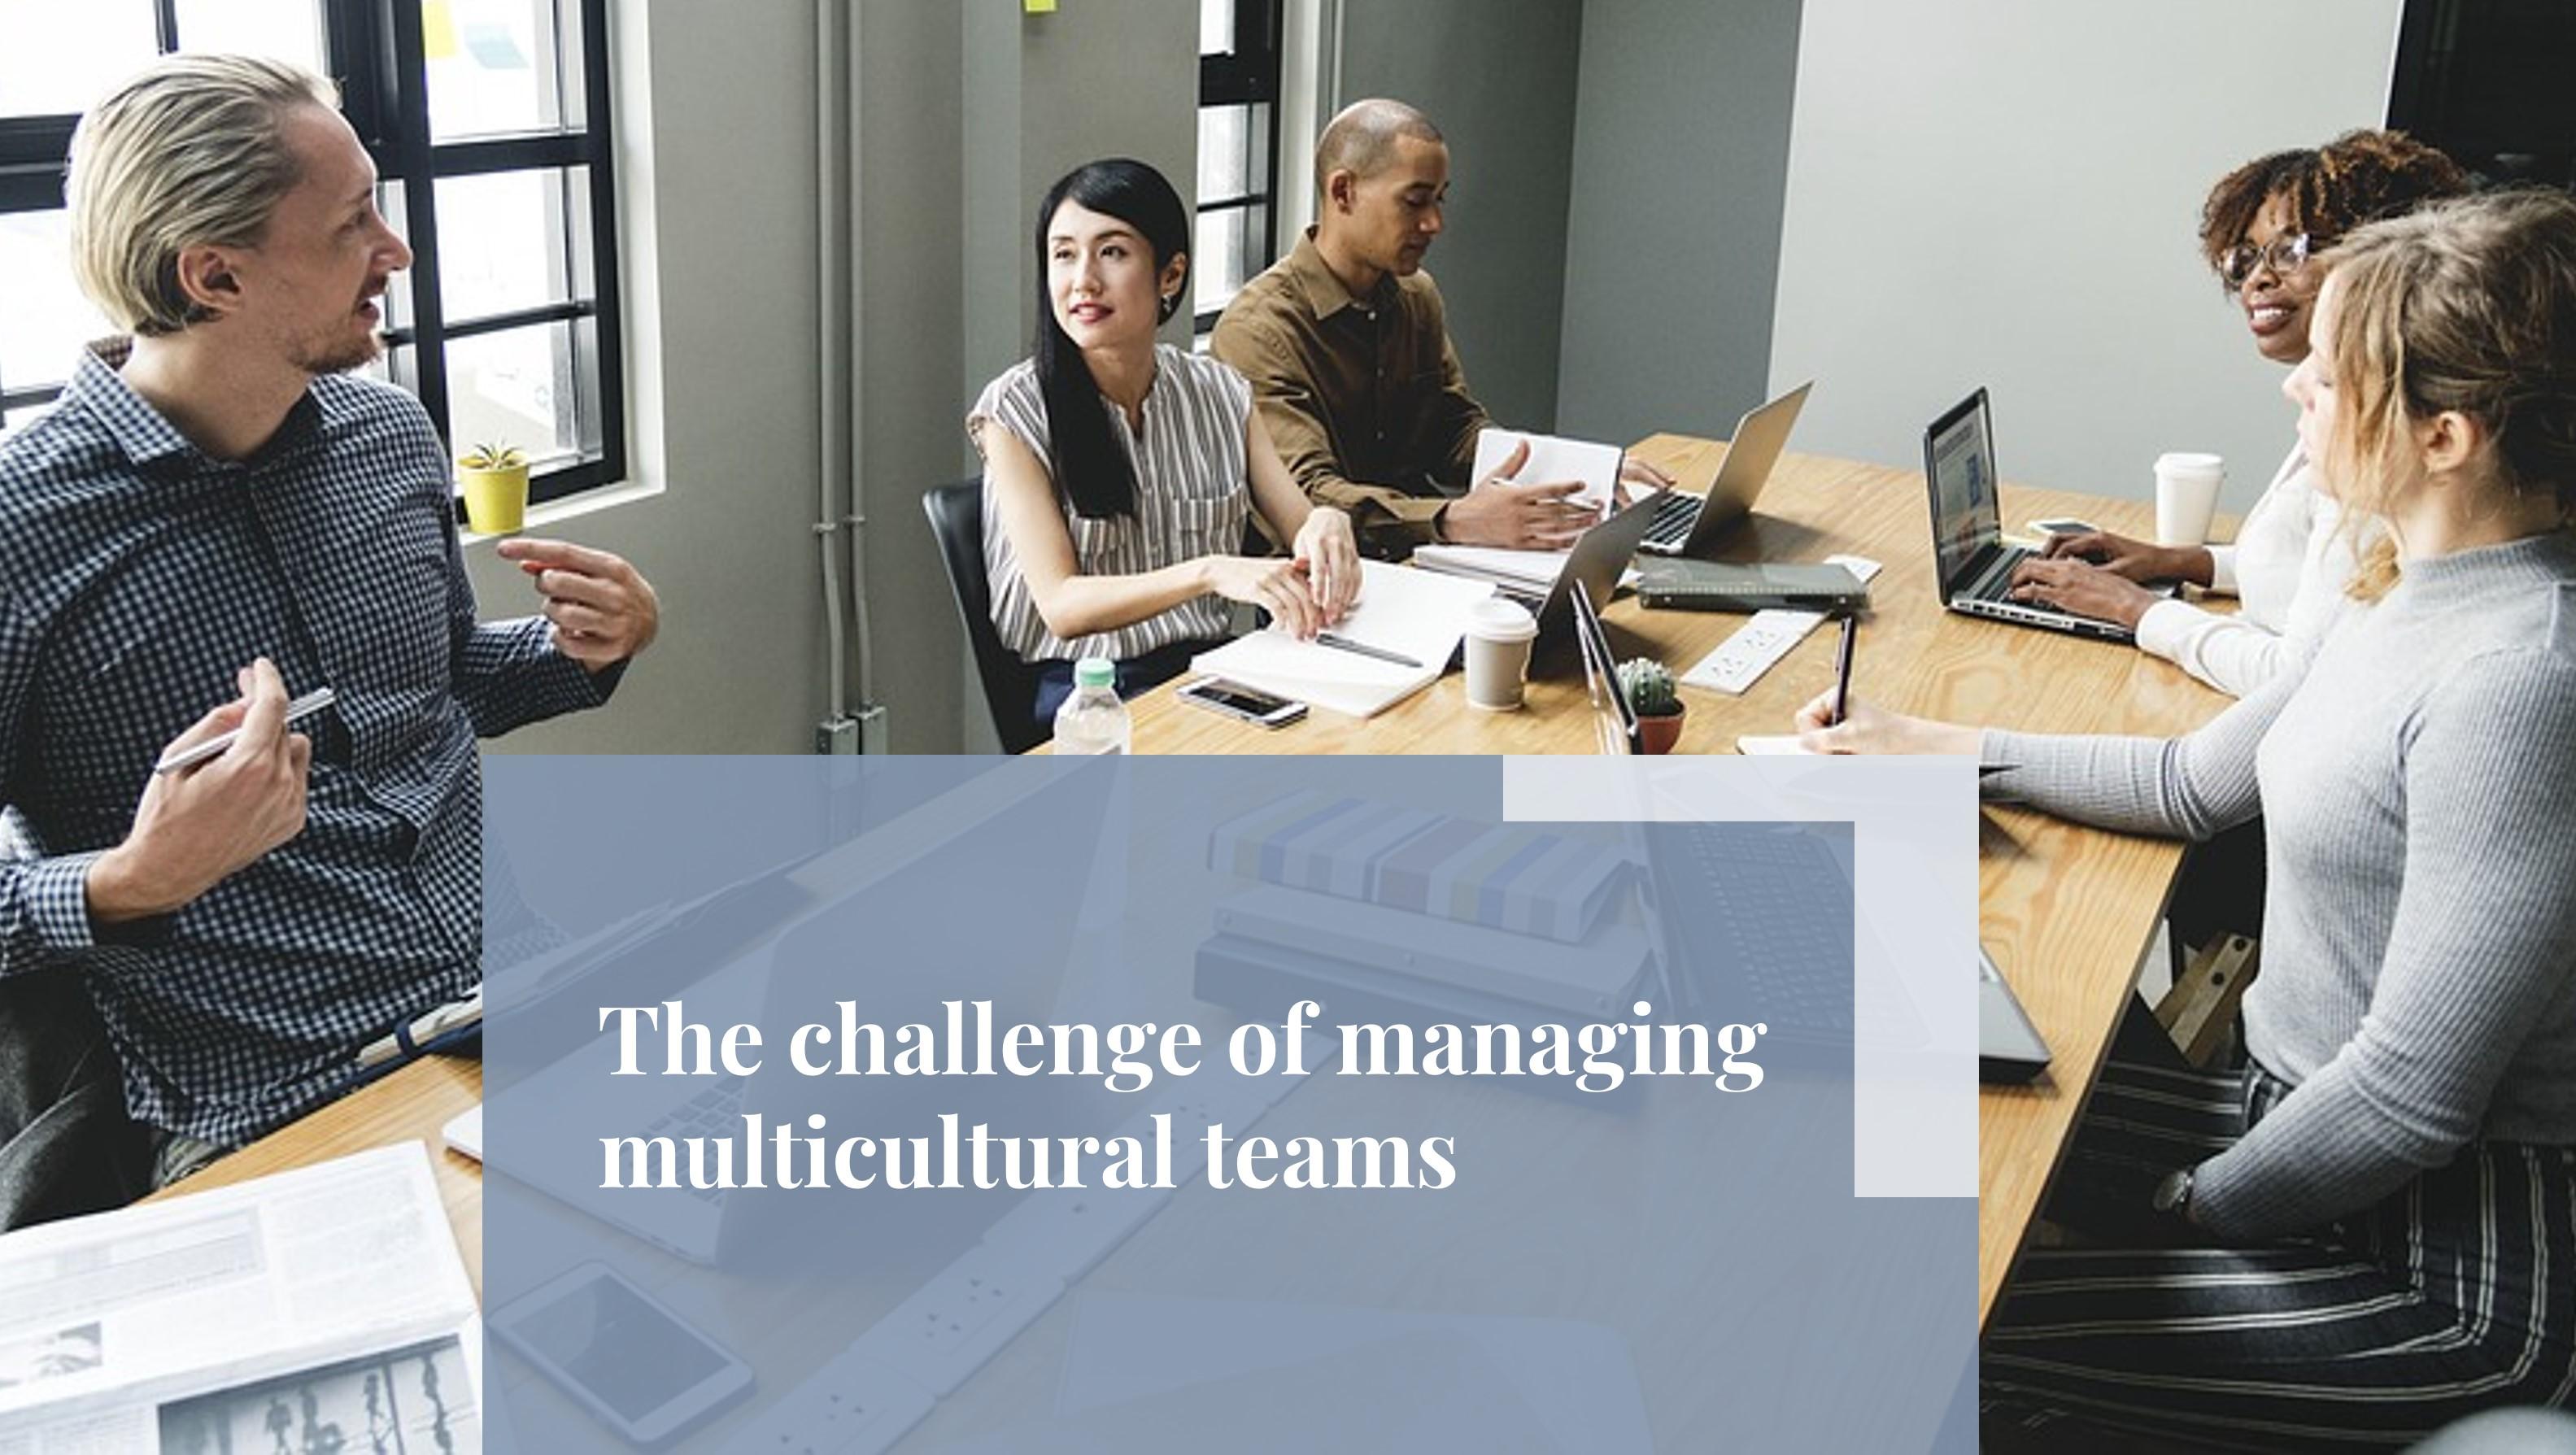 managing multicultural teams - Loftus Bradford